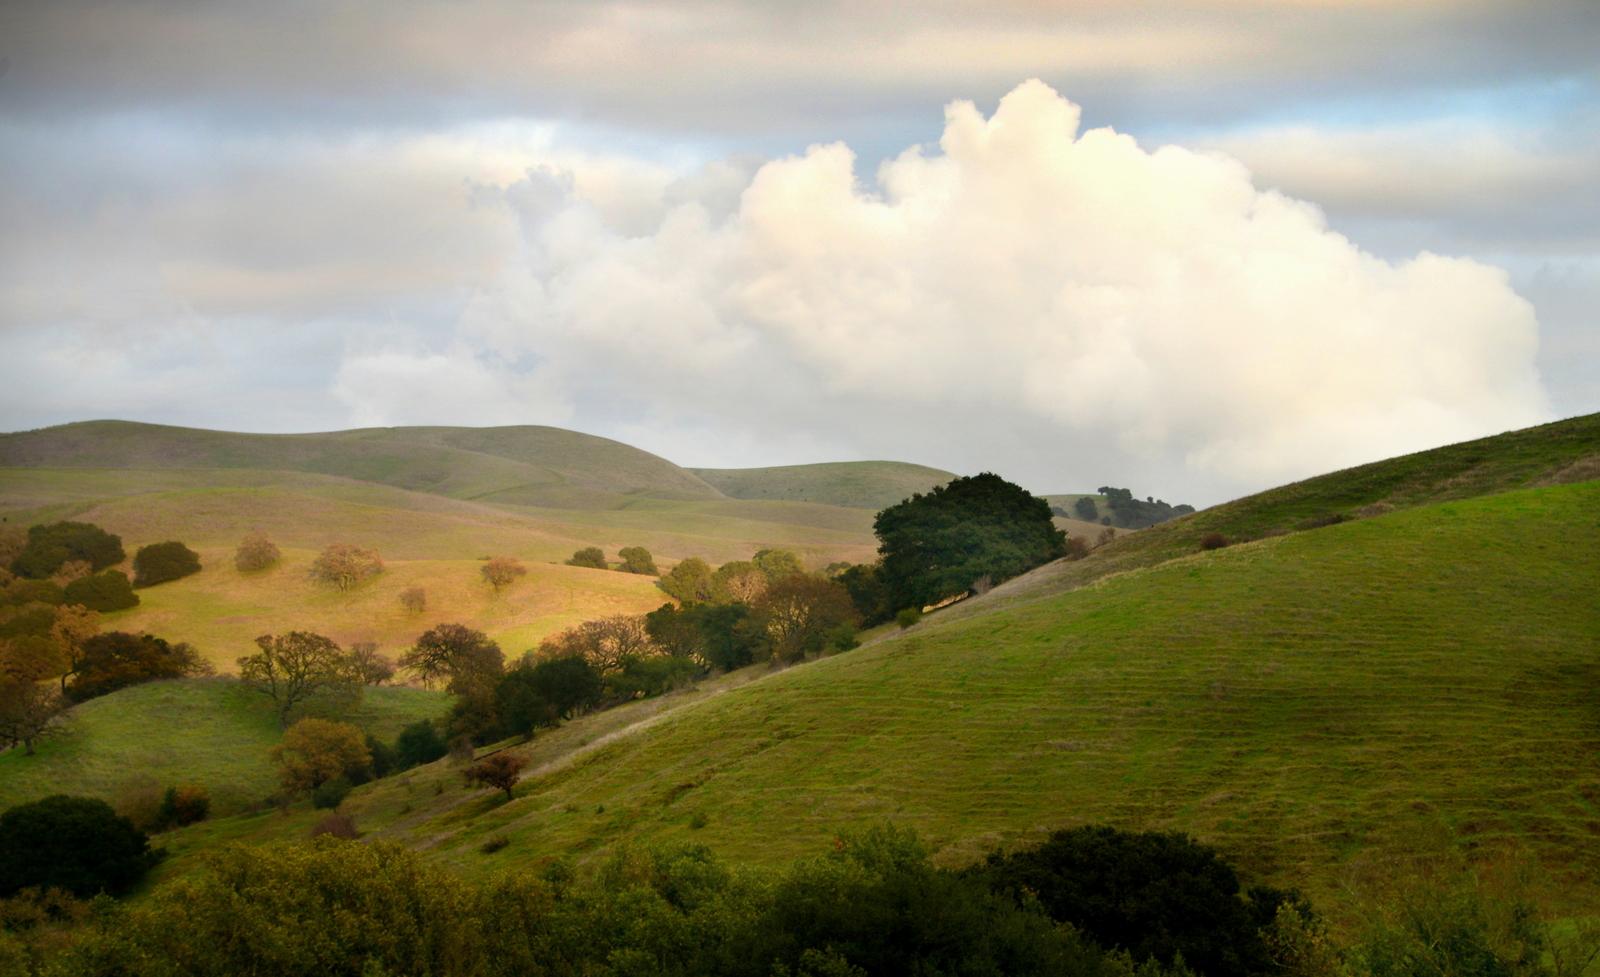 The Fernandez Ranch rolling hills and oak filled ravines